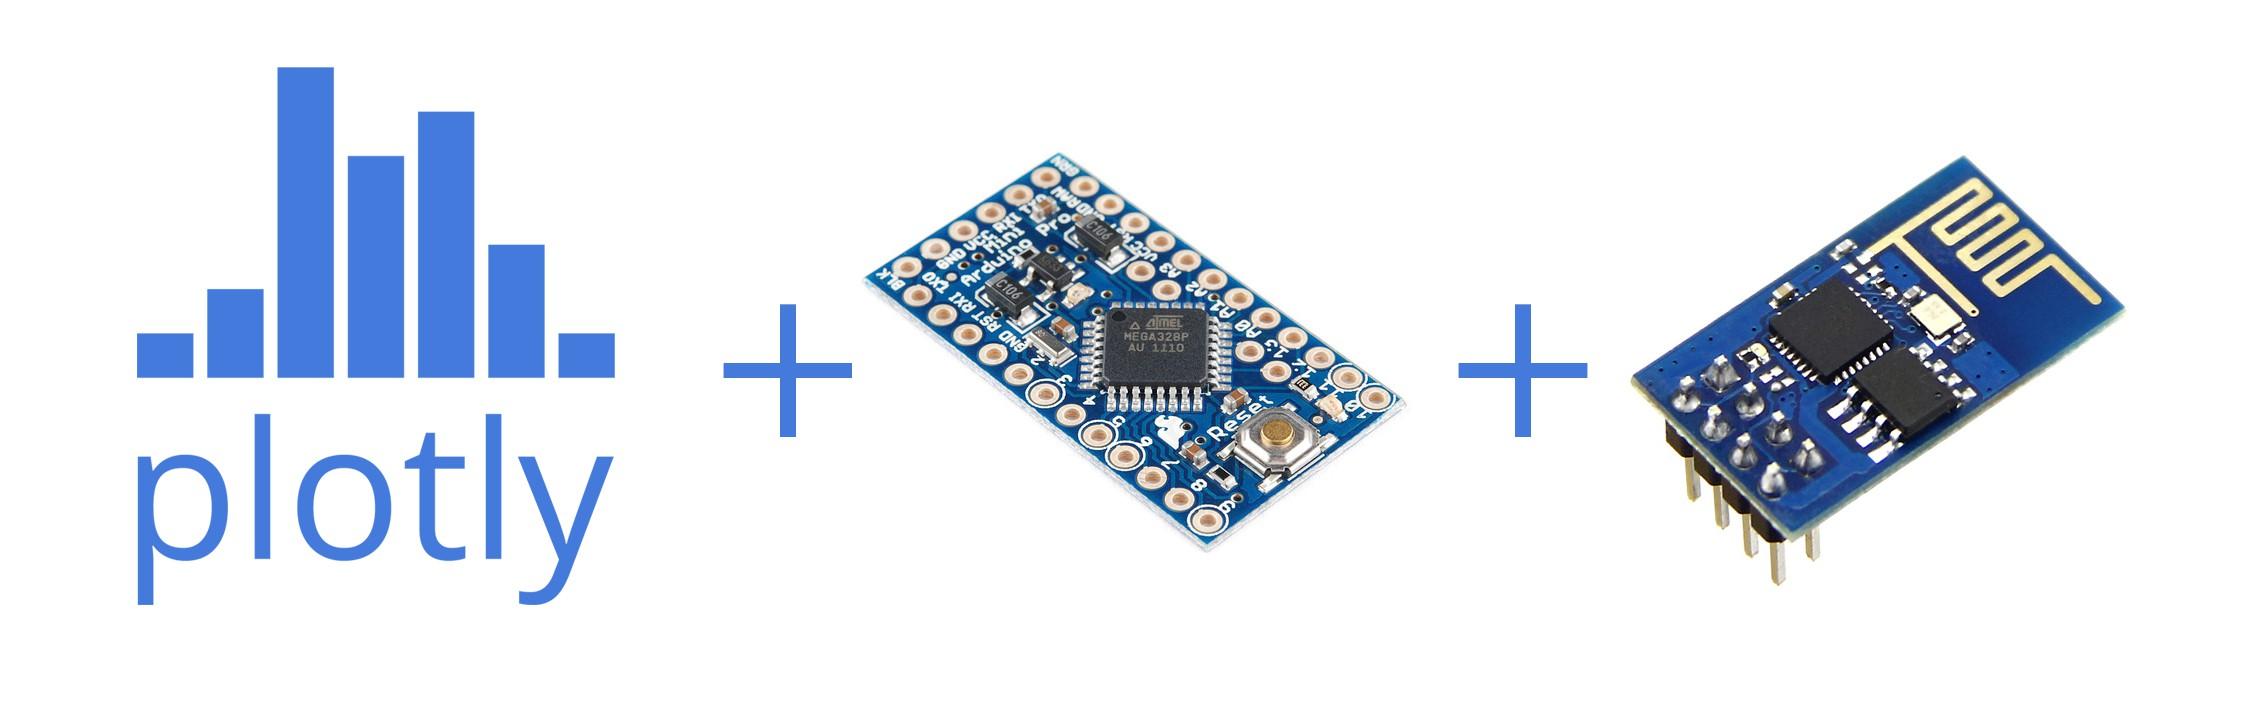 plotly + Arduino + ESP8266 | Hackaday io